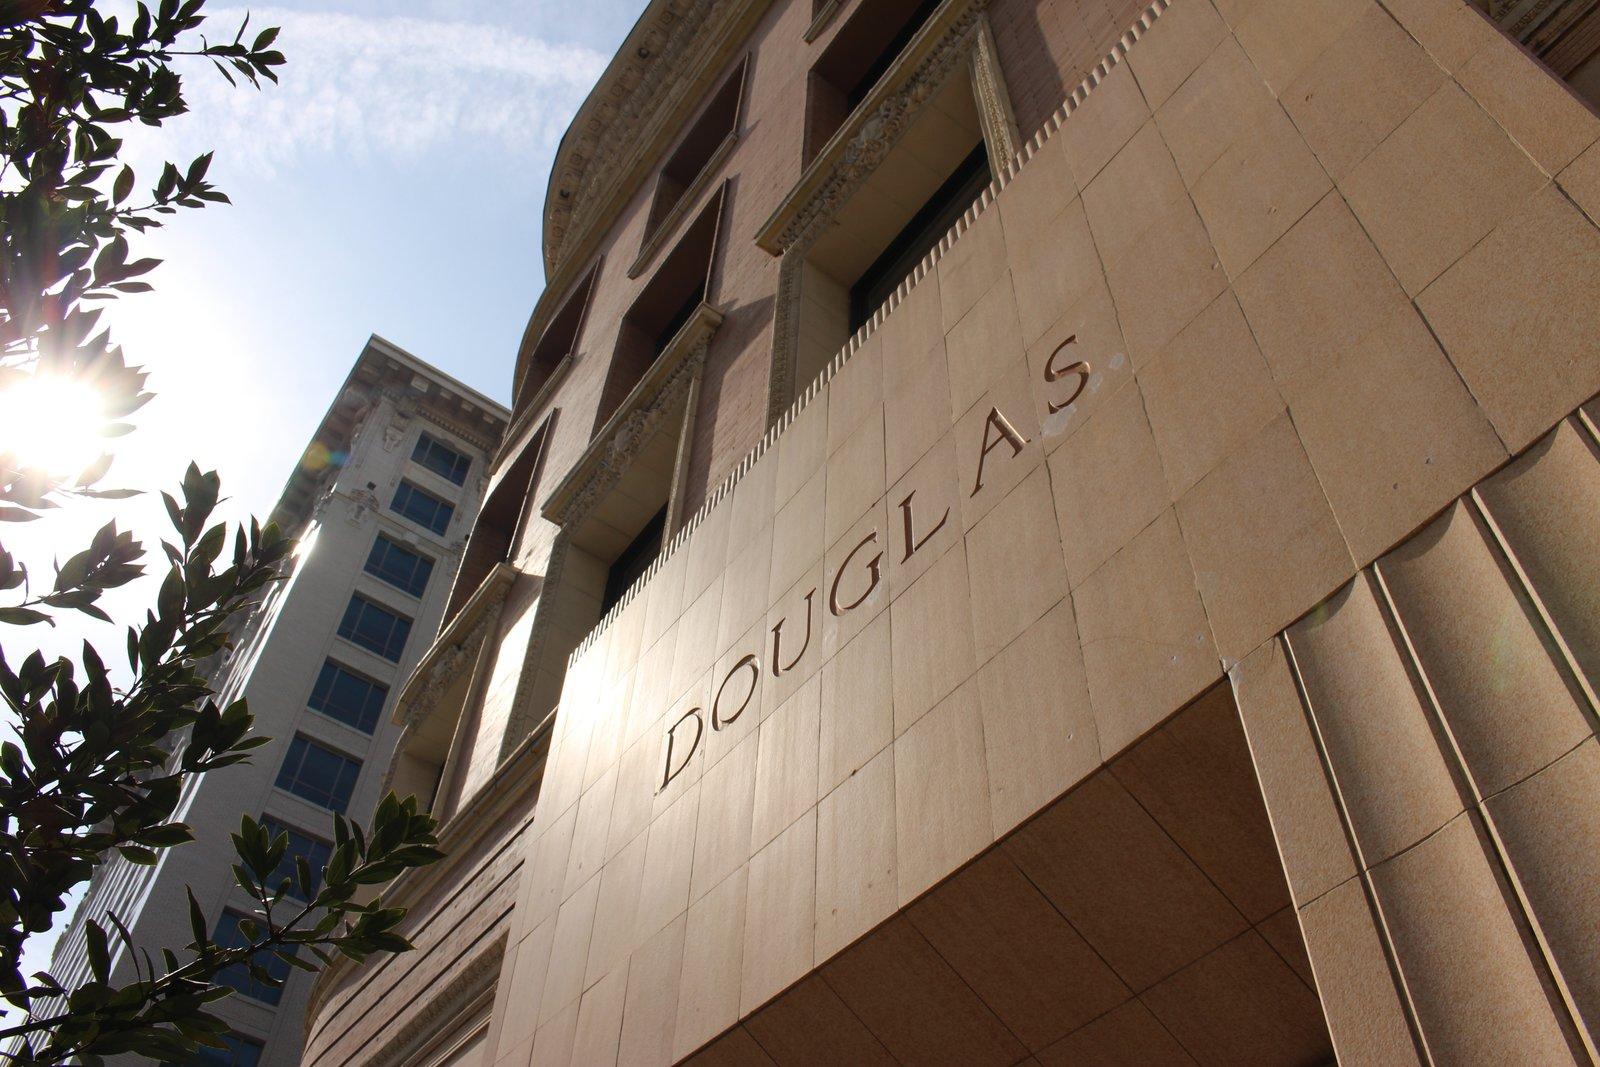 Photo 2 of 7 in Designer Douglas Loft For Sale